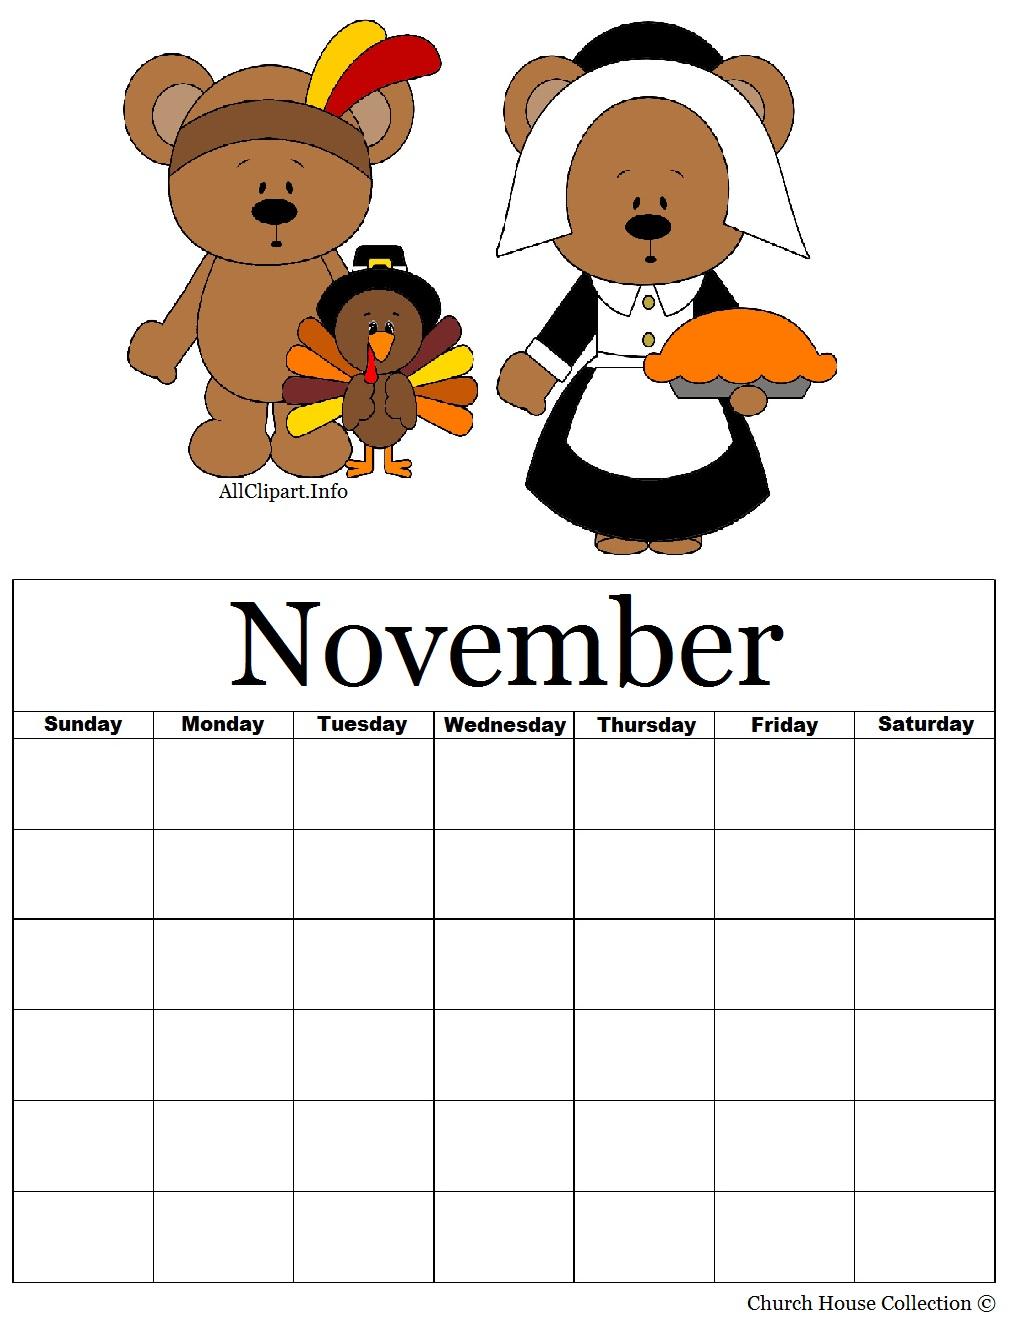 Thanksgiving Calendar Art : Church house collection pilgrim and indian printable